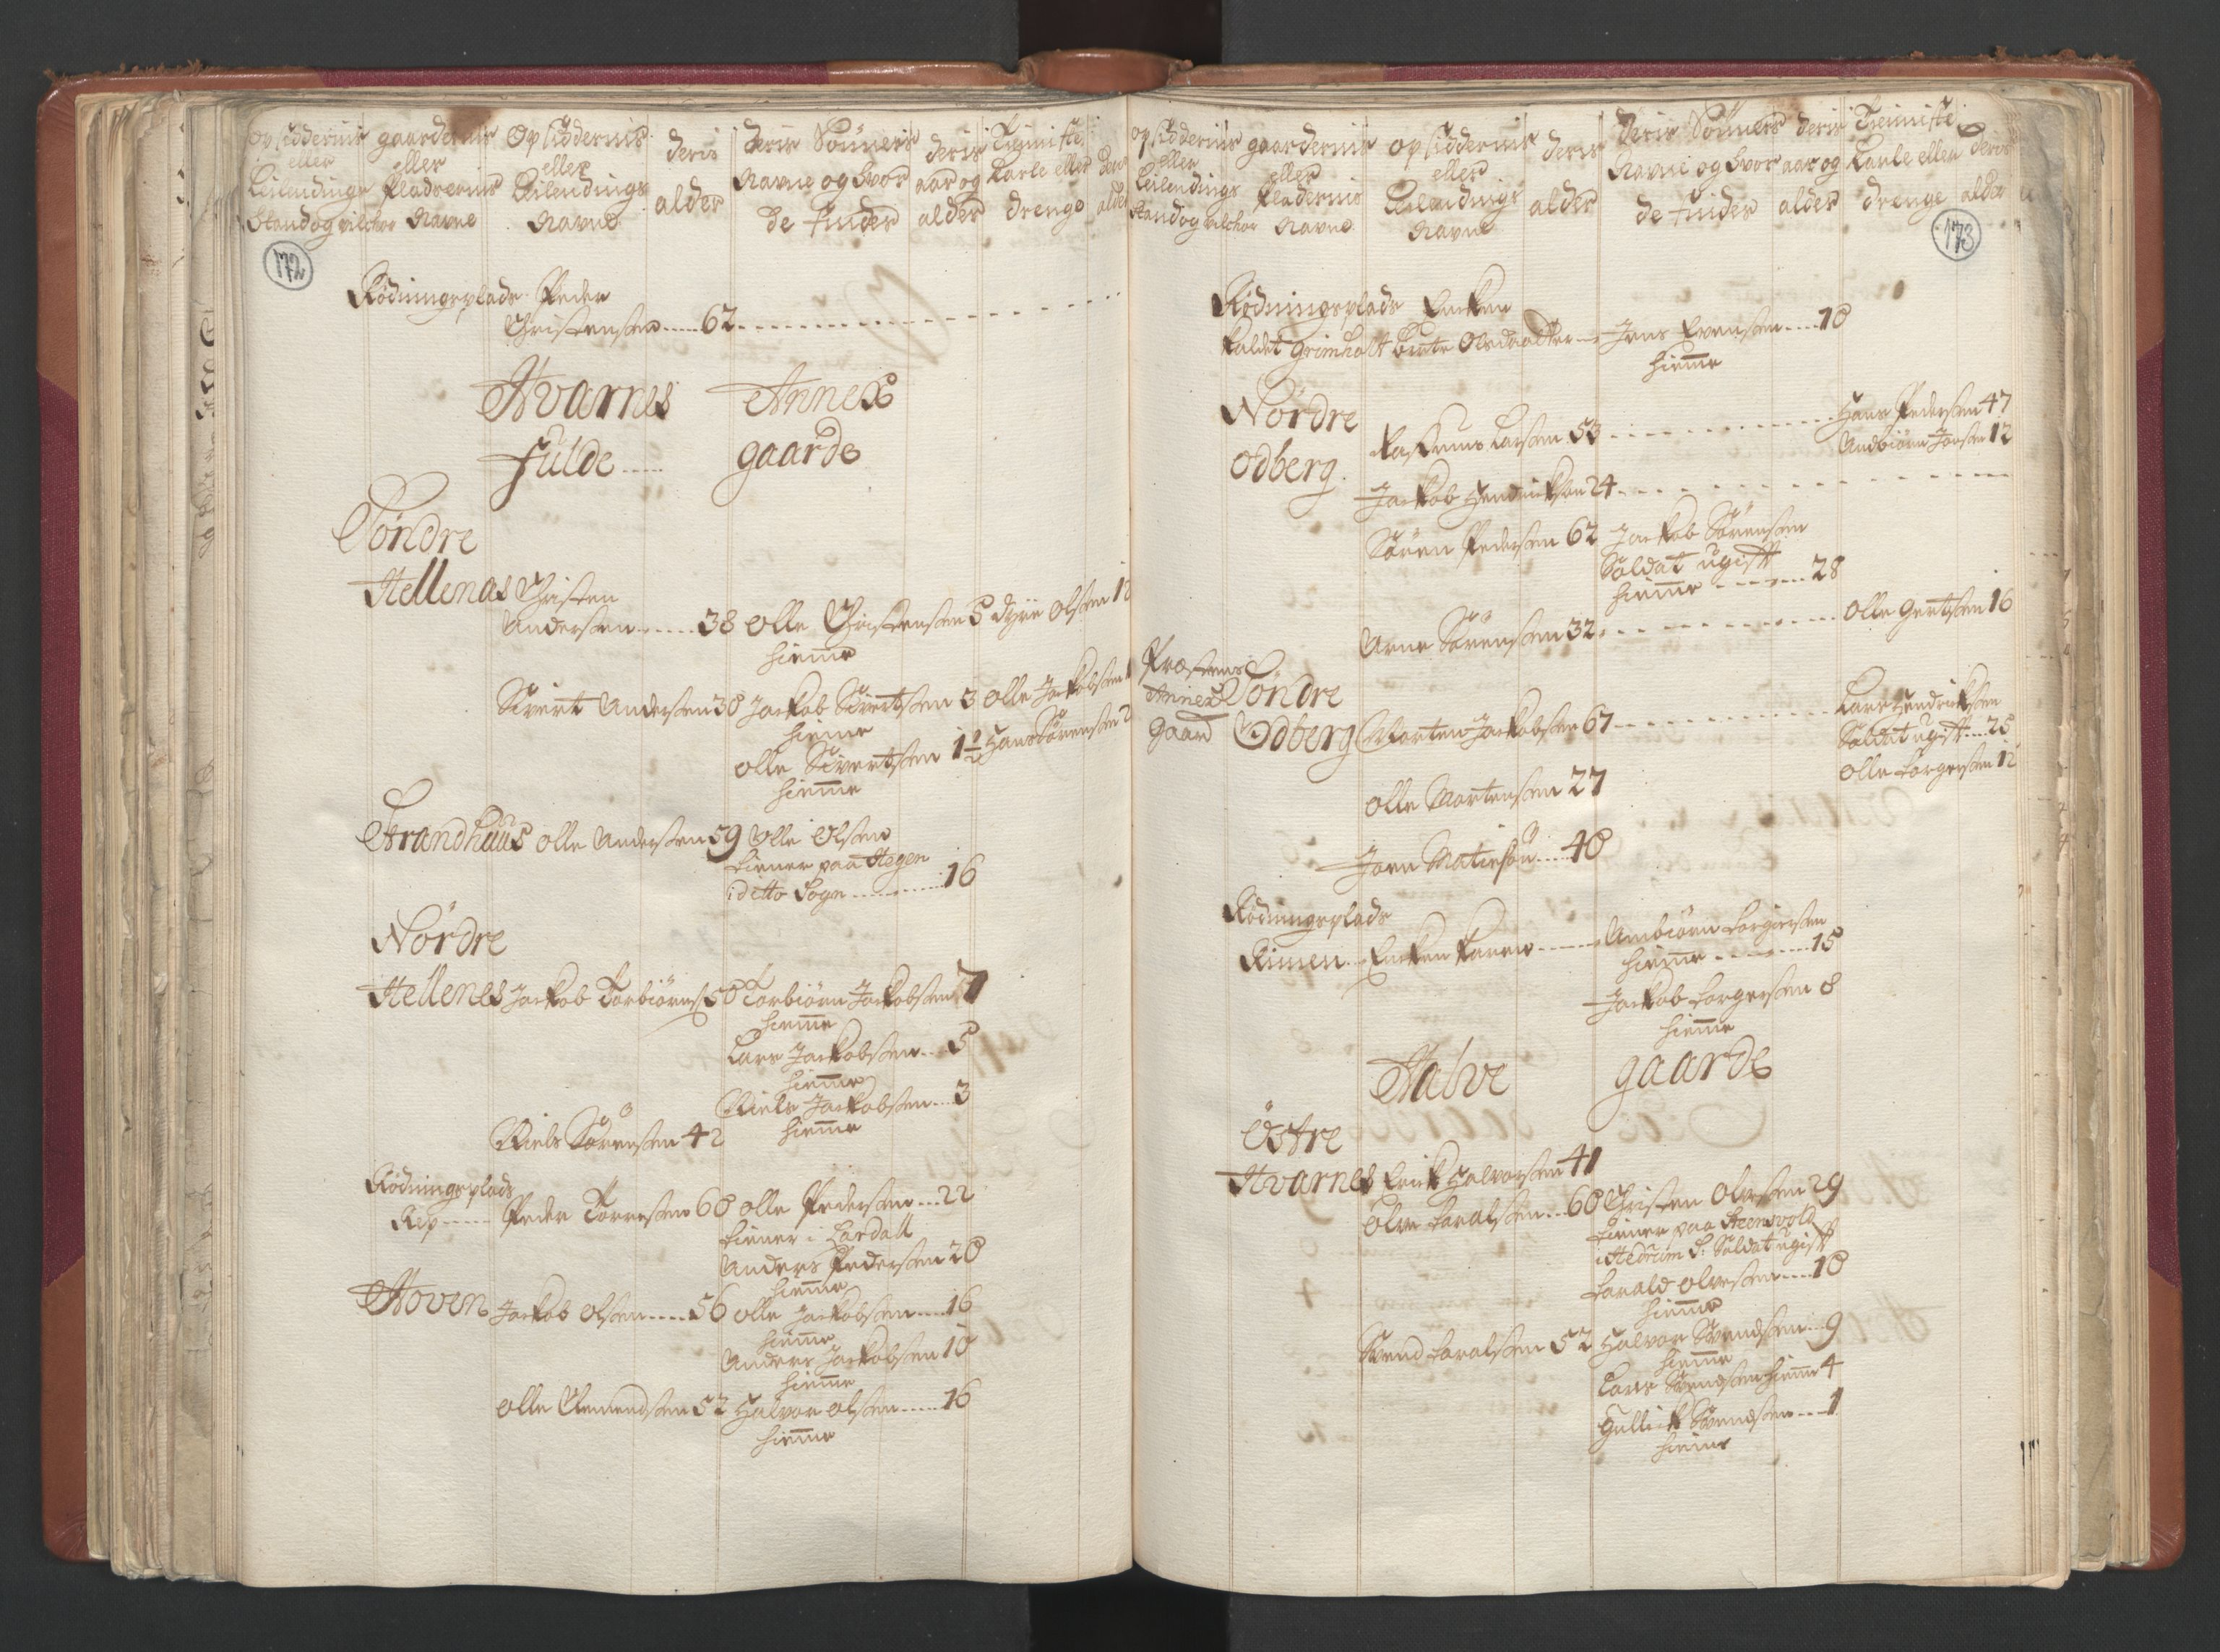 RA, Manntallet 1701, nr. 2: Solør, Odal og Østerdal fogderi og Larvik grevskap, 1701, s. 172-173